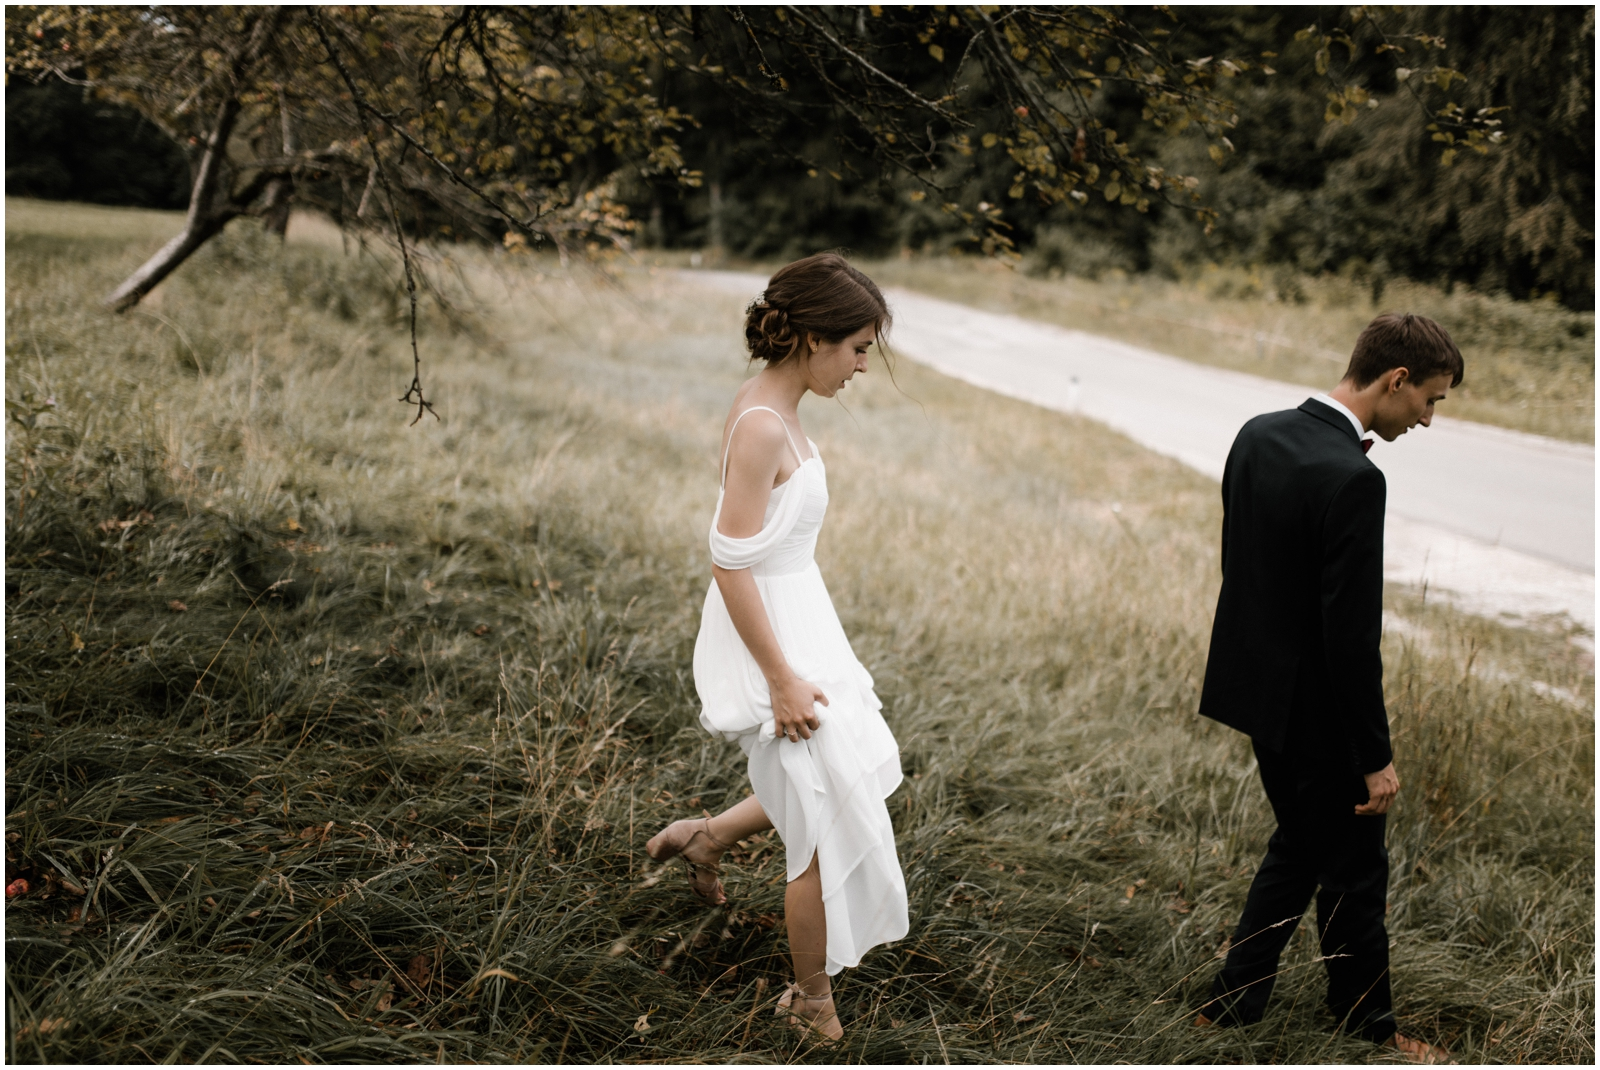 mirjam_thomas_wedding-171.jpg